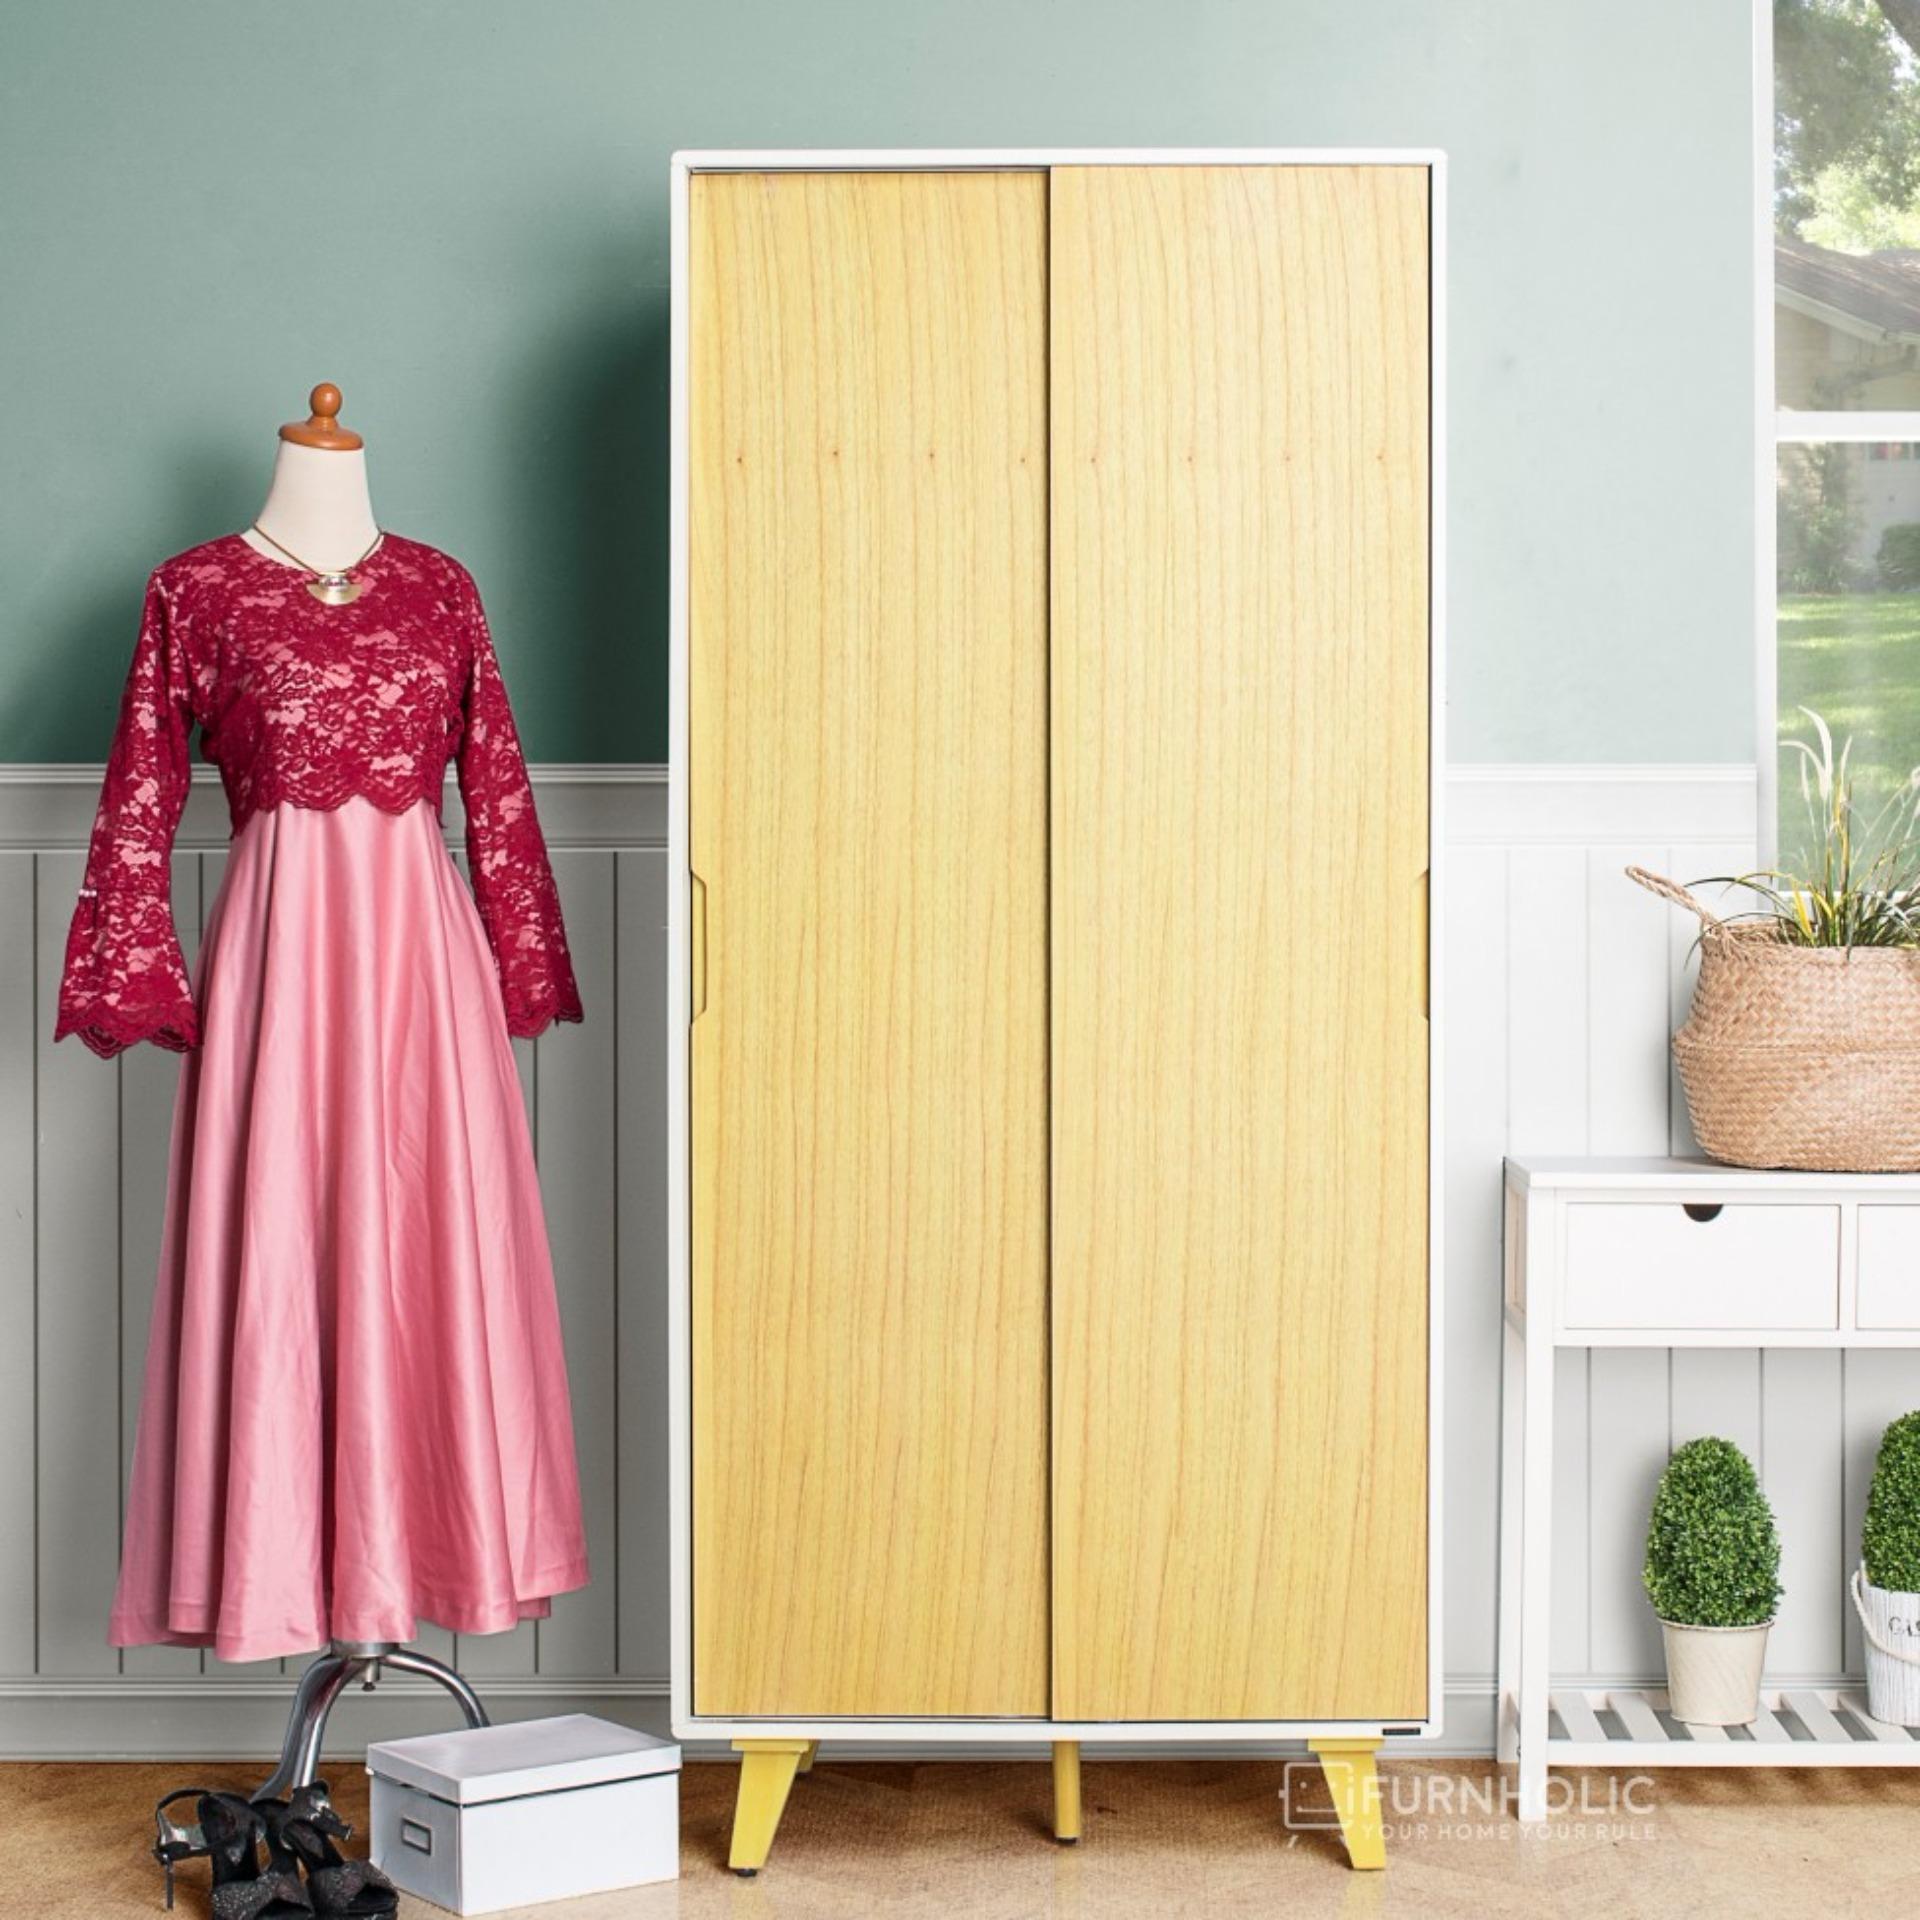 iFurnholic Helsinki Wardrobe Sliding Door - Lemari Pakaian - Nature - Gratis Pengiriman Pulau Jawa dan Denpasar